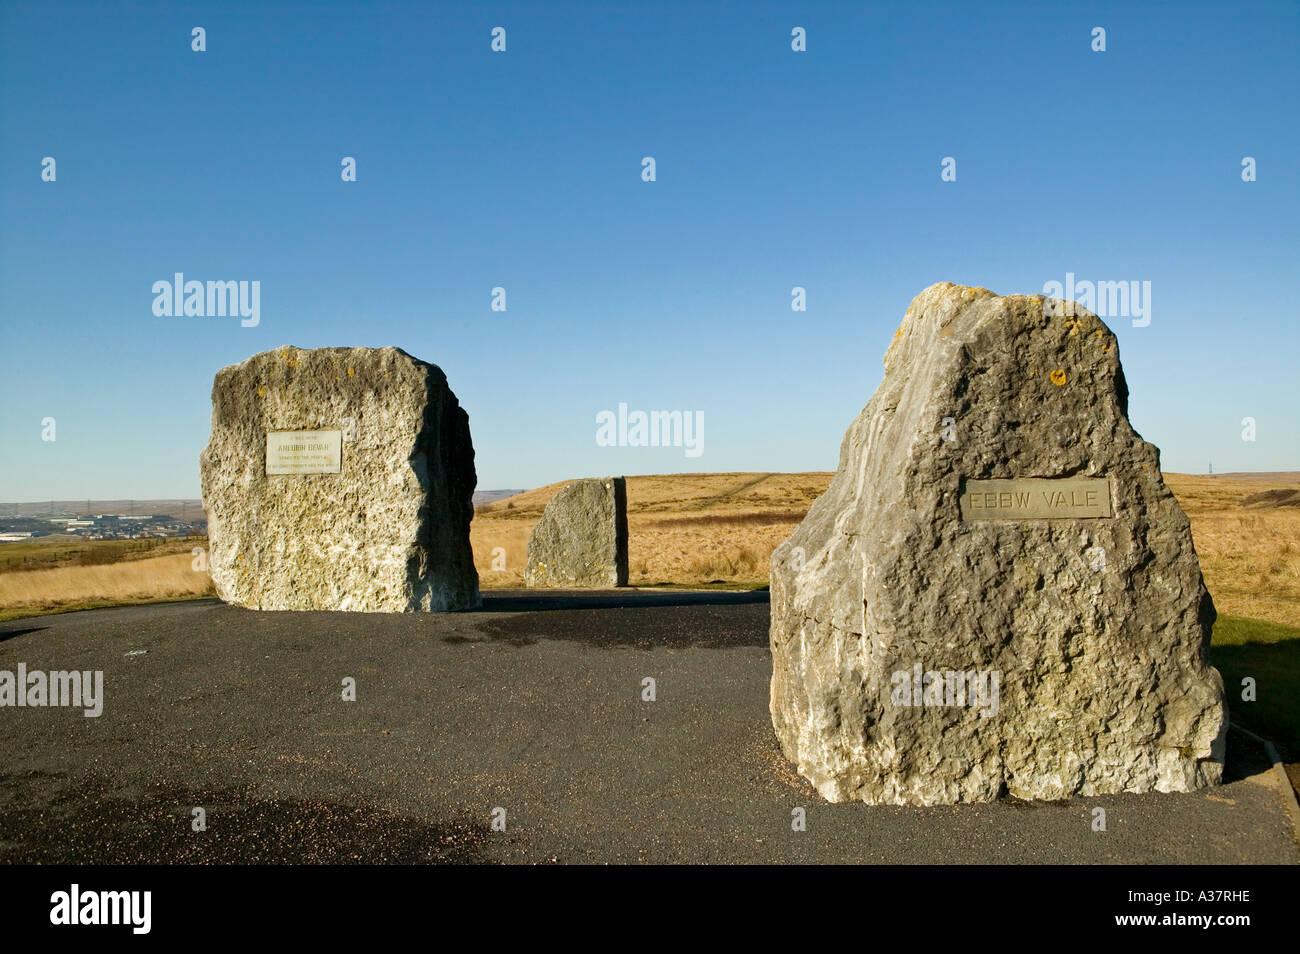 The Aneurin Bevan Memorial Stones at Bryn Serth near Ebbw Vale Wales UK - Stock Image